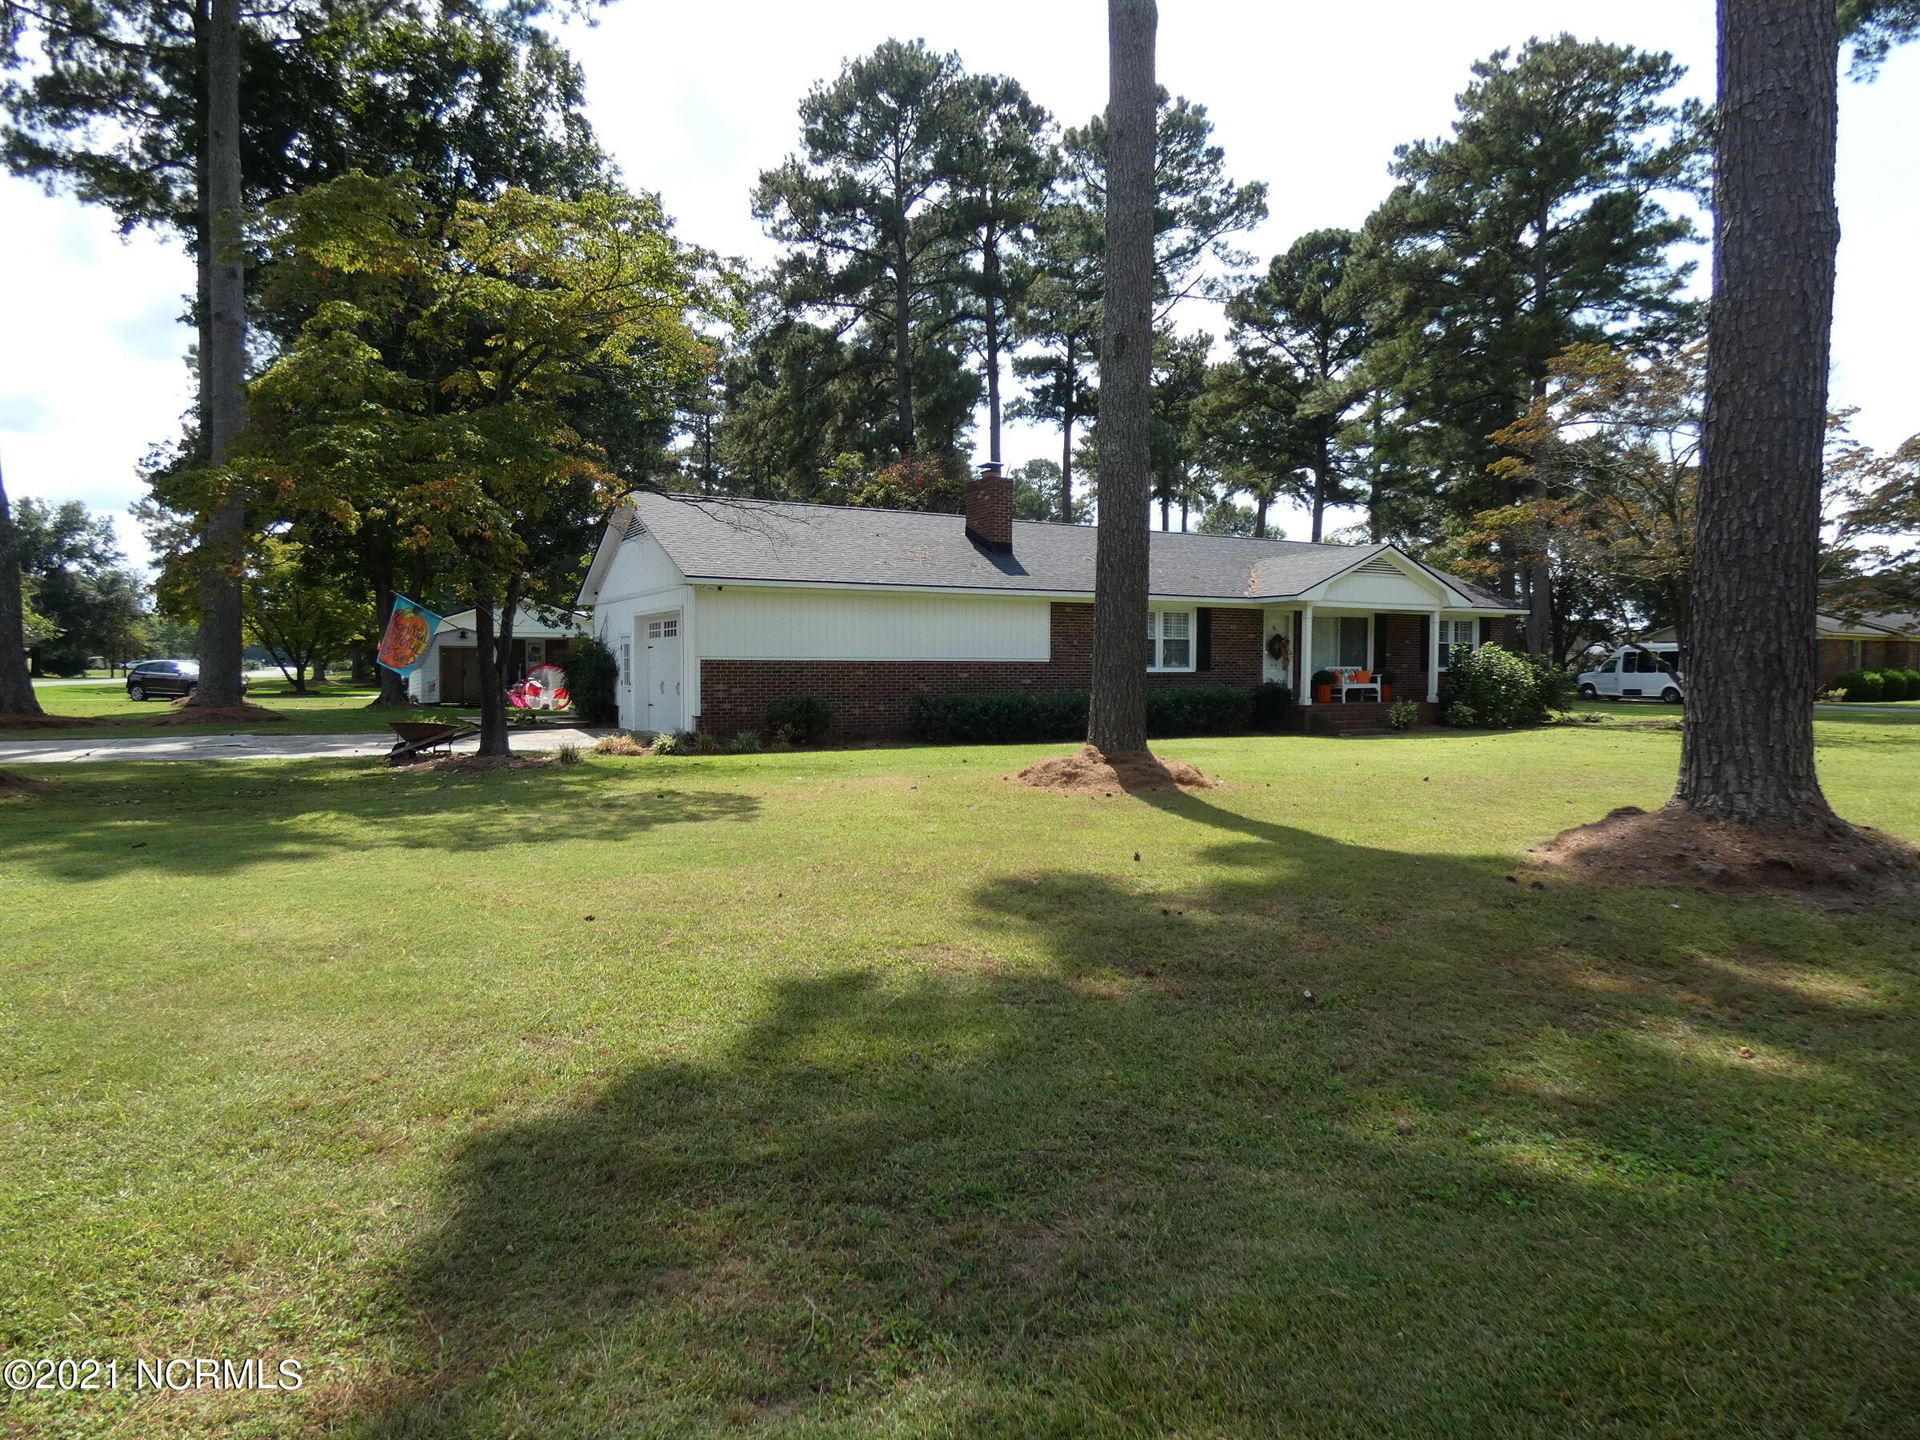 Photo of 606 Fairfax Street, Clinton, NC 28328 (MLS # 100291006)